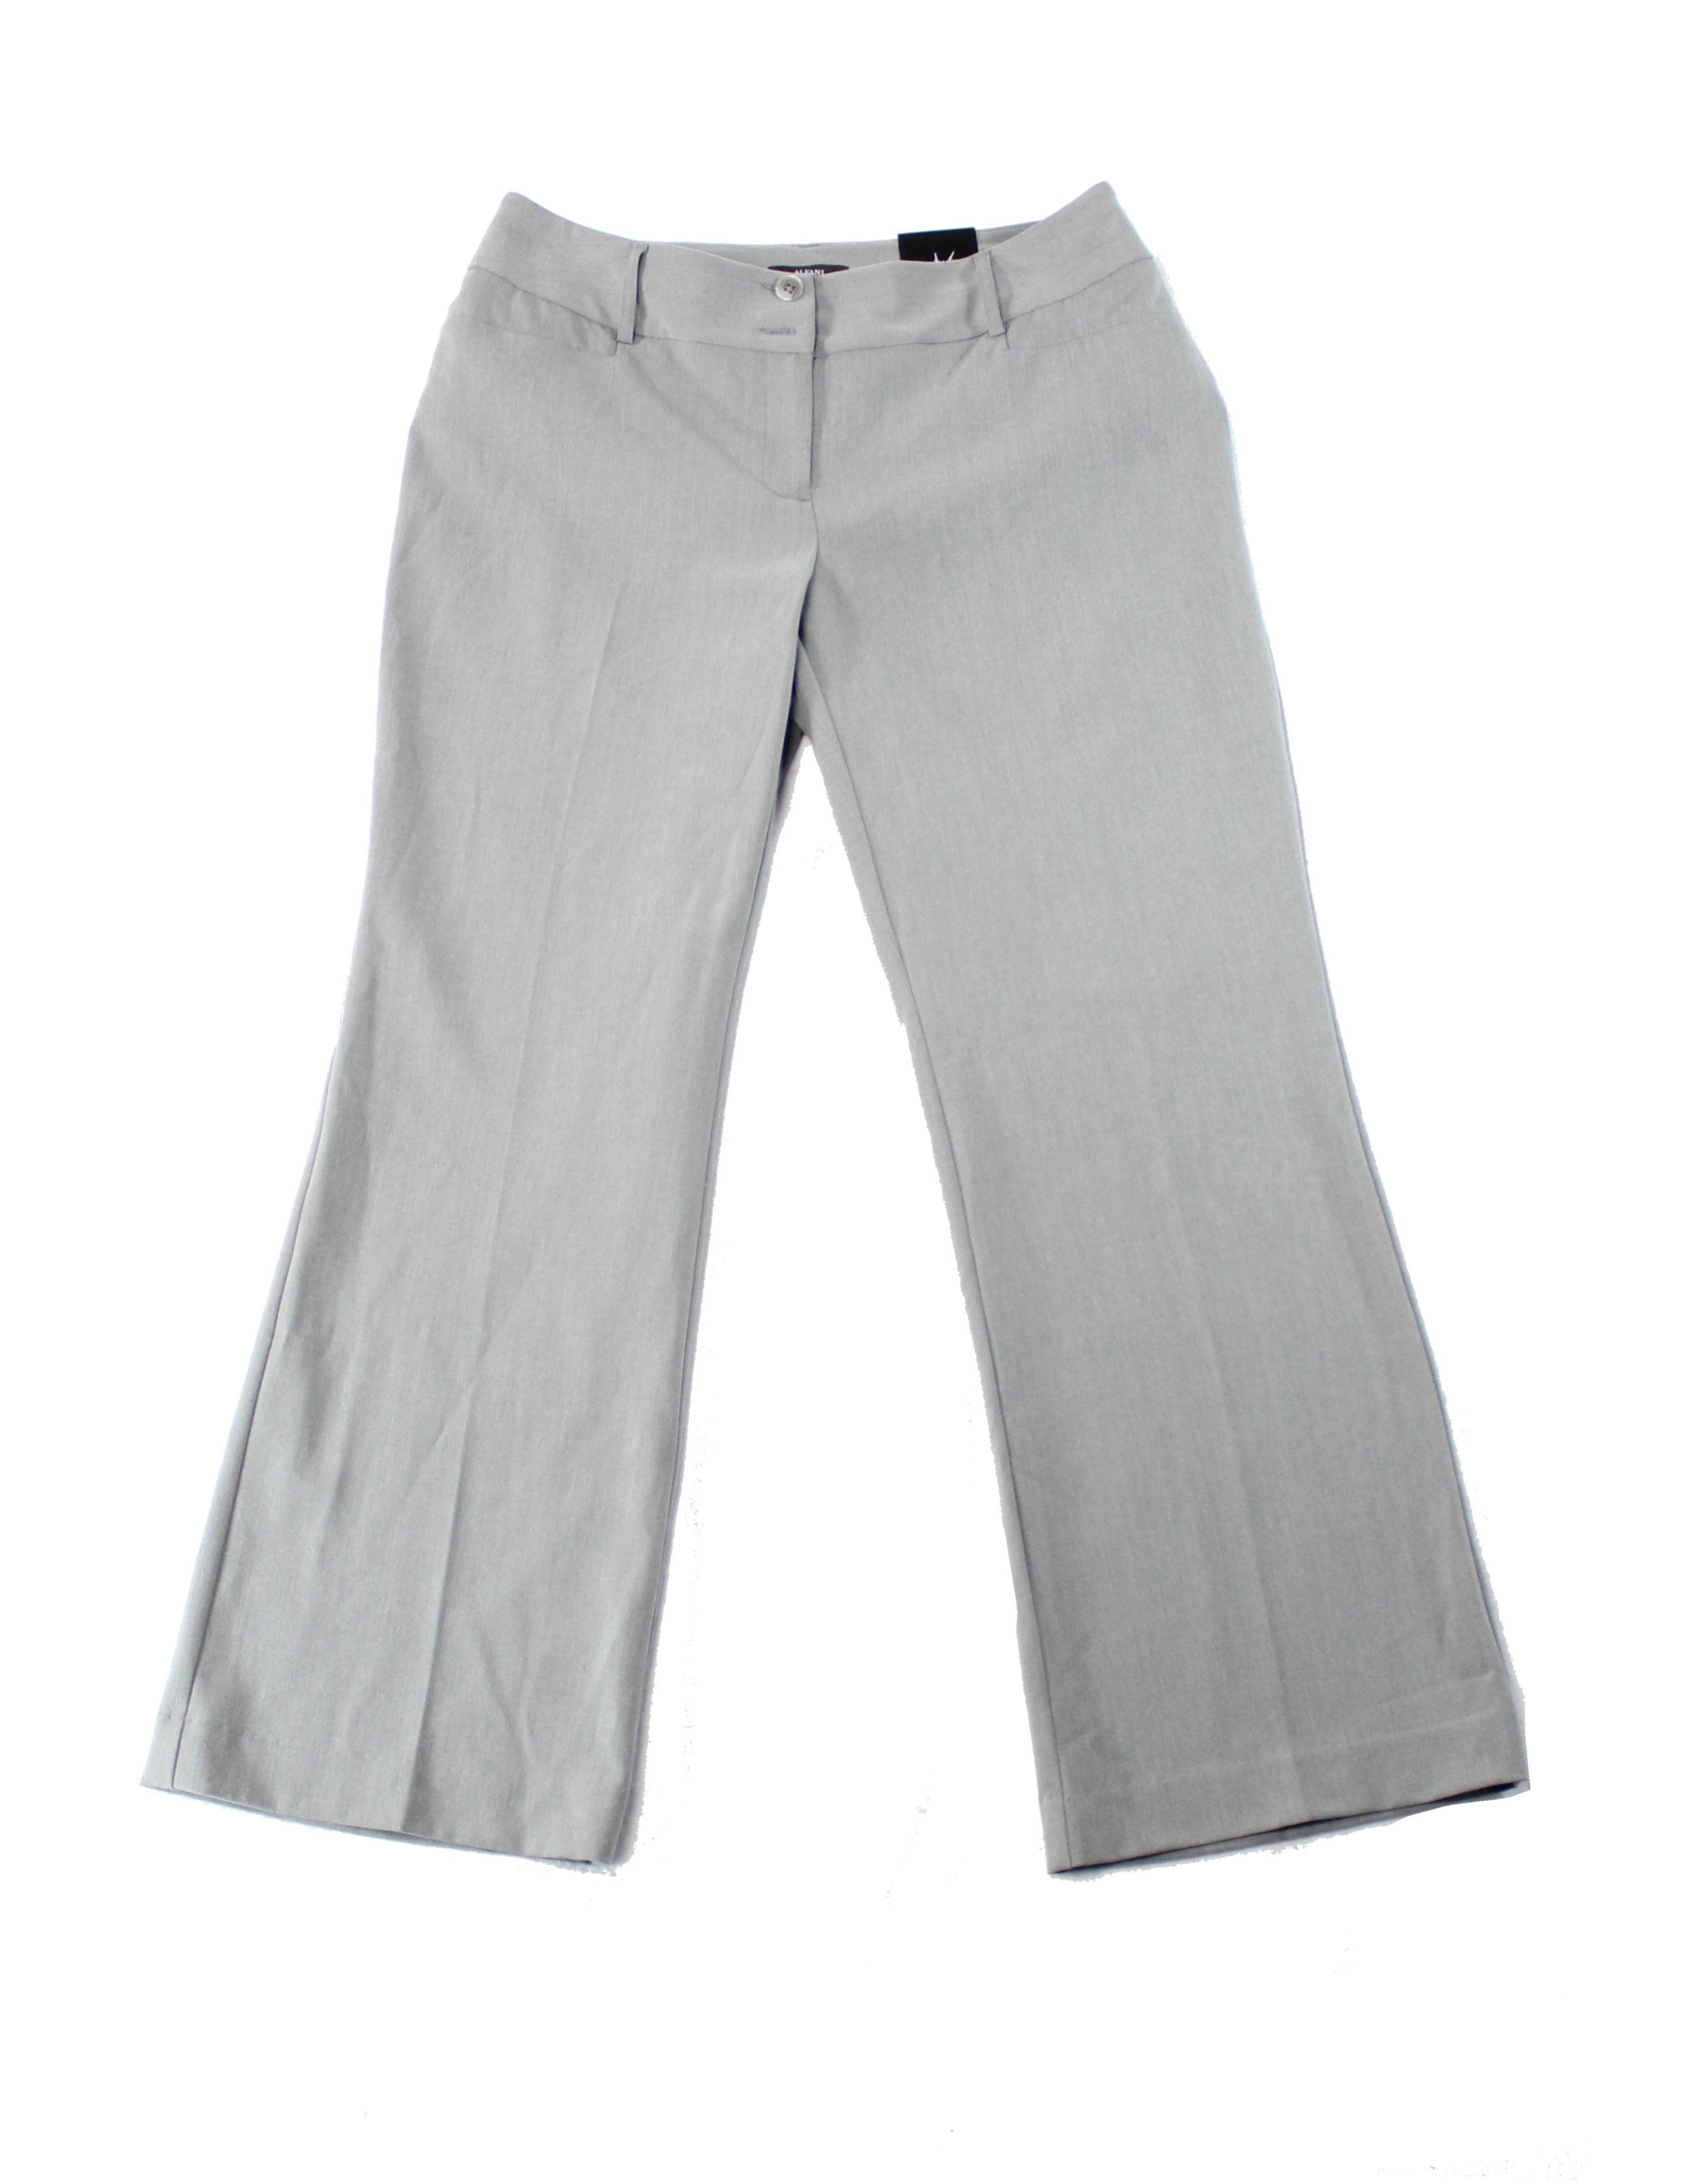 Alfani NEW Gray Womens Size 10S Short Curvy Fit Trouser Dress Pants